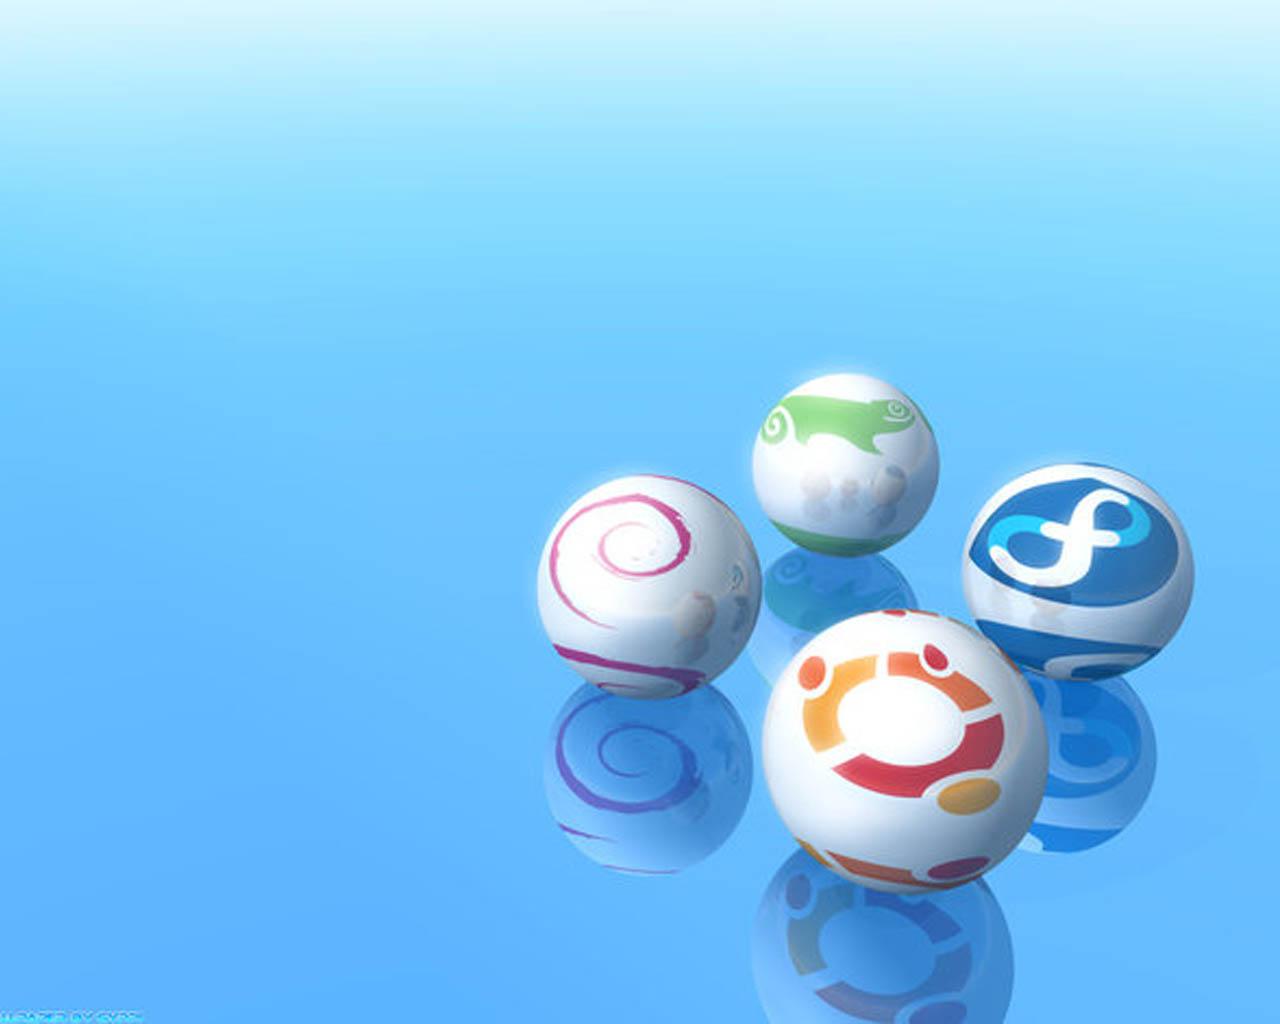 http://2.bp.blogspot.com/_EQ_drV0Mu5U/TOtvZnAUuKI/AAAAAAAAAJY/FnRo7O4OgS8/s1600/Fedora+7+Linux+Wallpapers+The+Desktop+Have+Balls.jpg